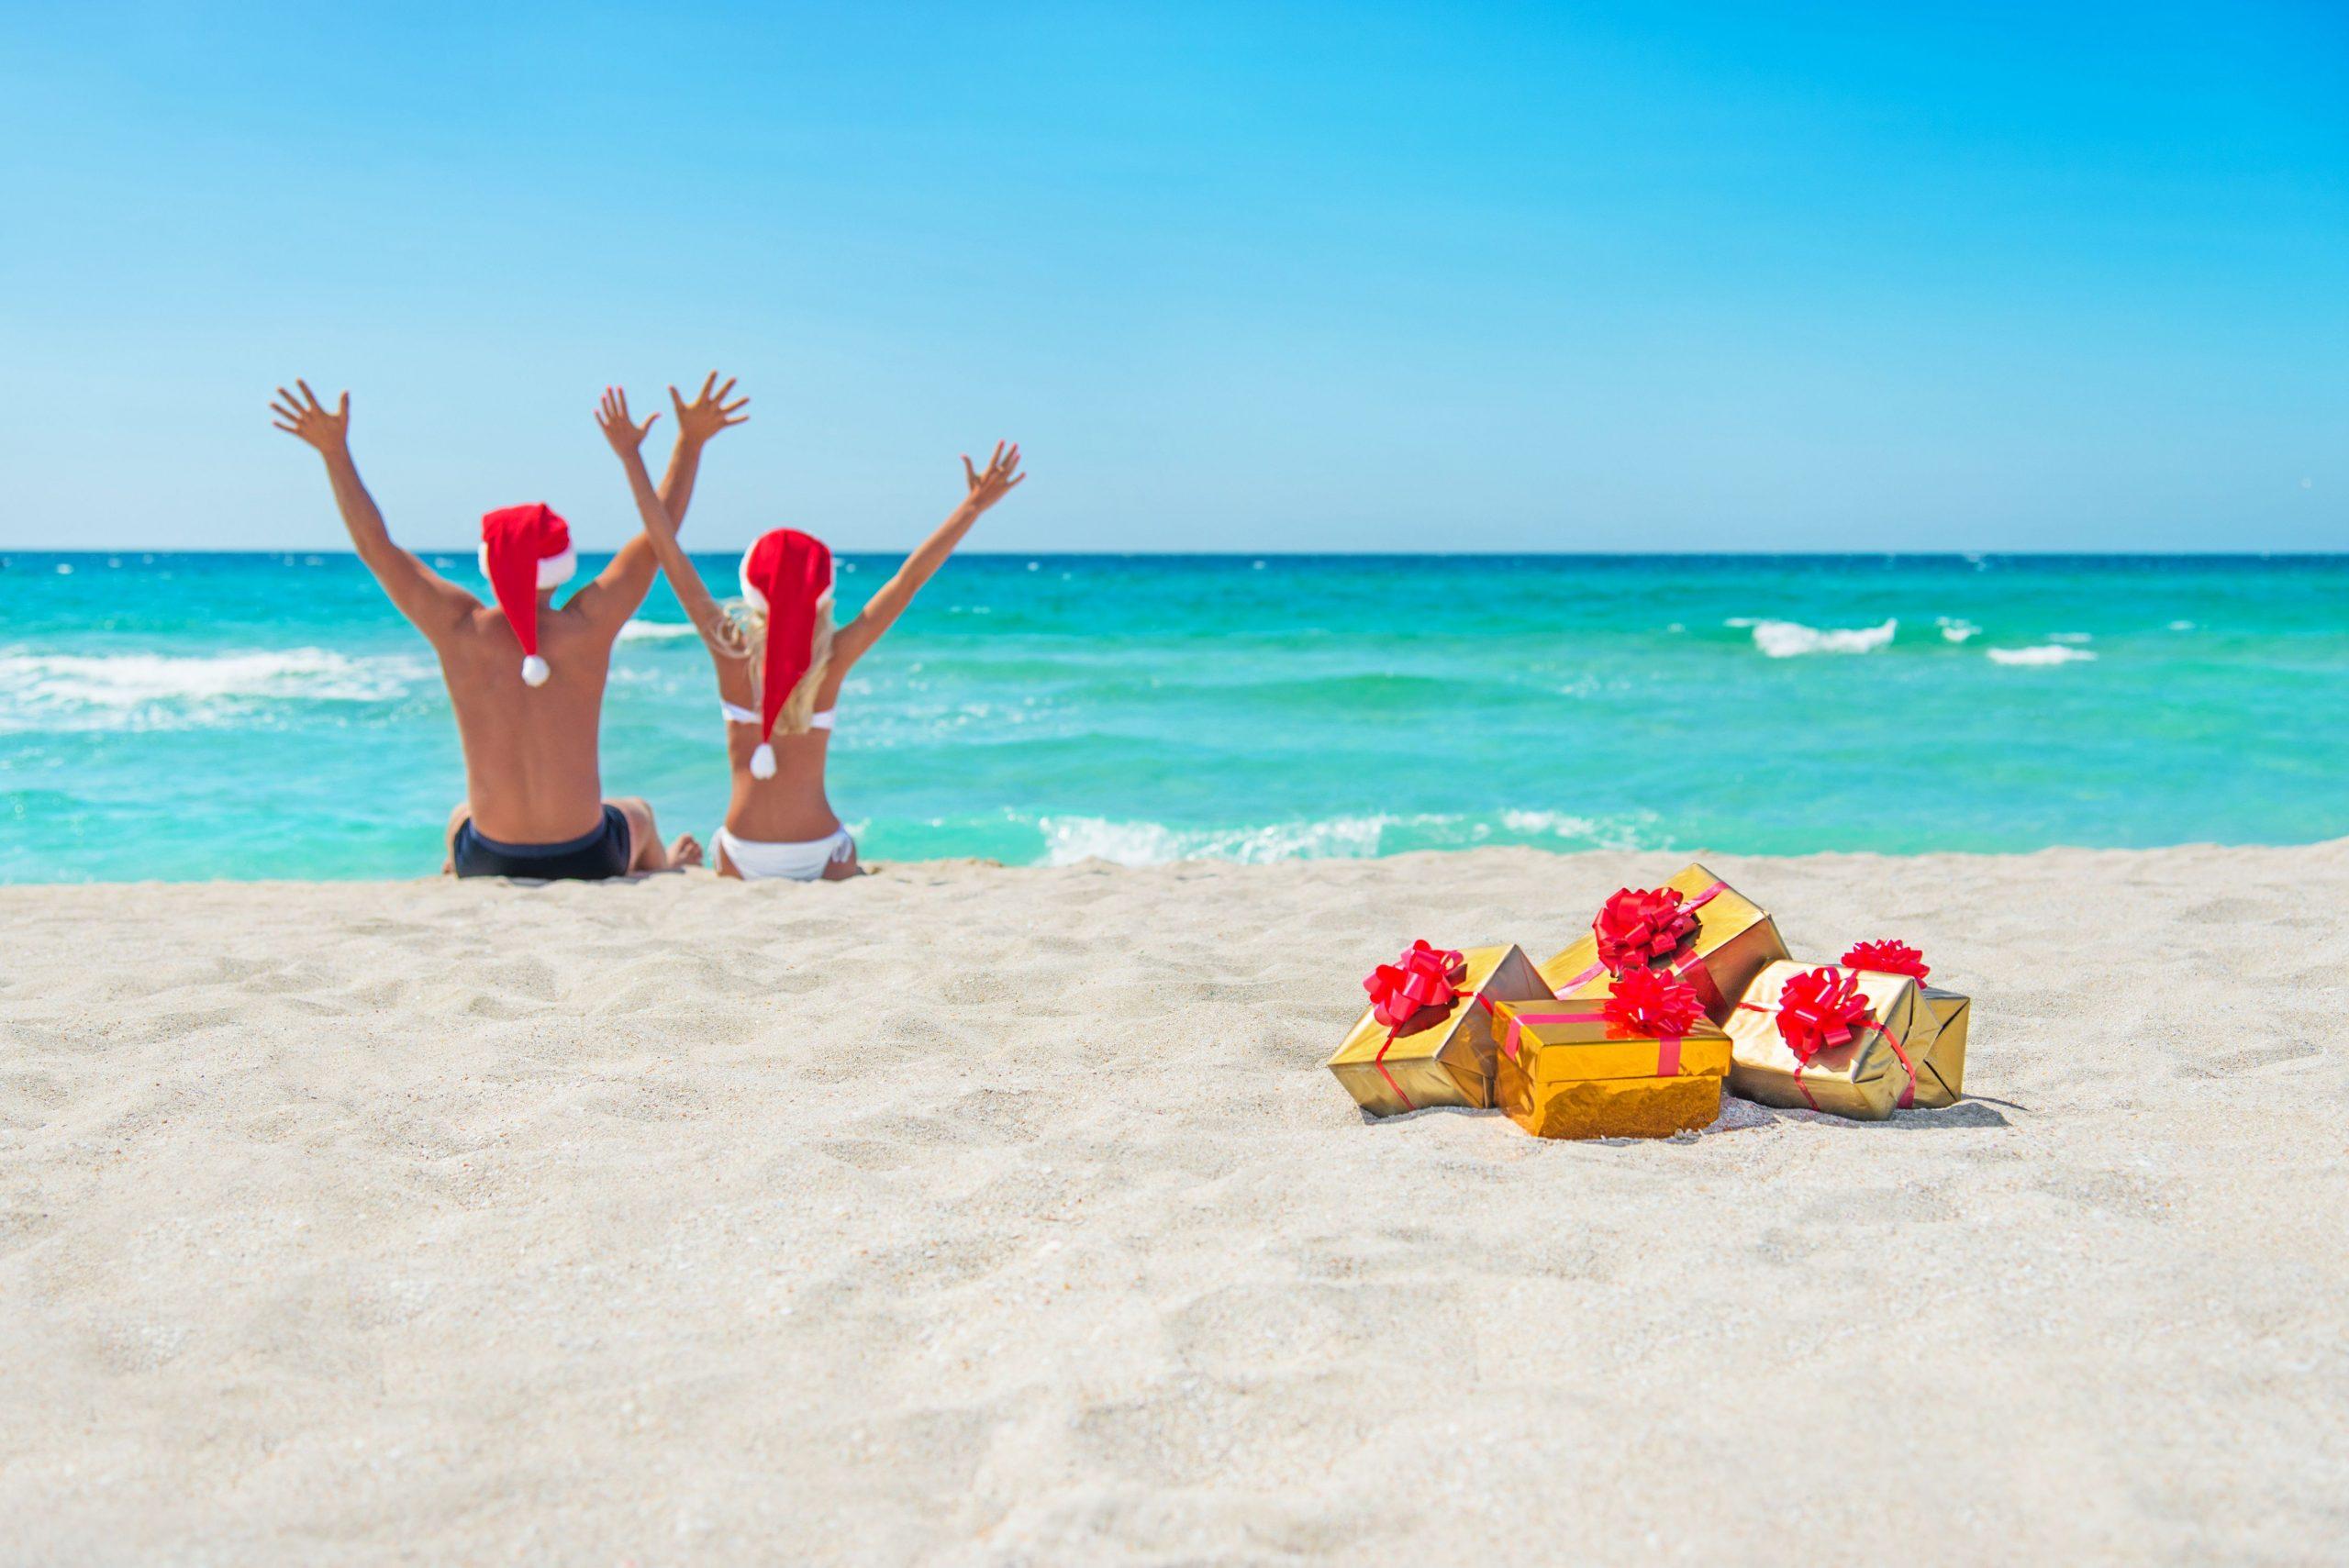 Hotel AHG WARIDI BEACH RESORT&SPA 4*, STD 1/2+1 park, POL, Novoletni  Zanzibar 10 dni